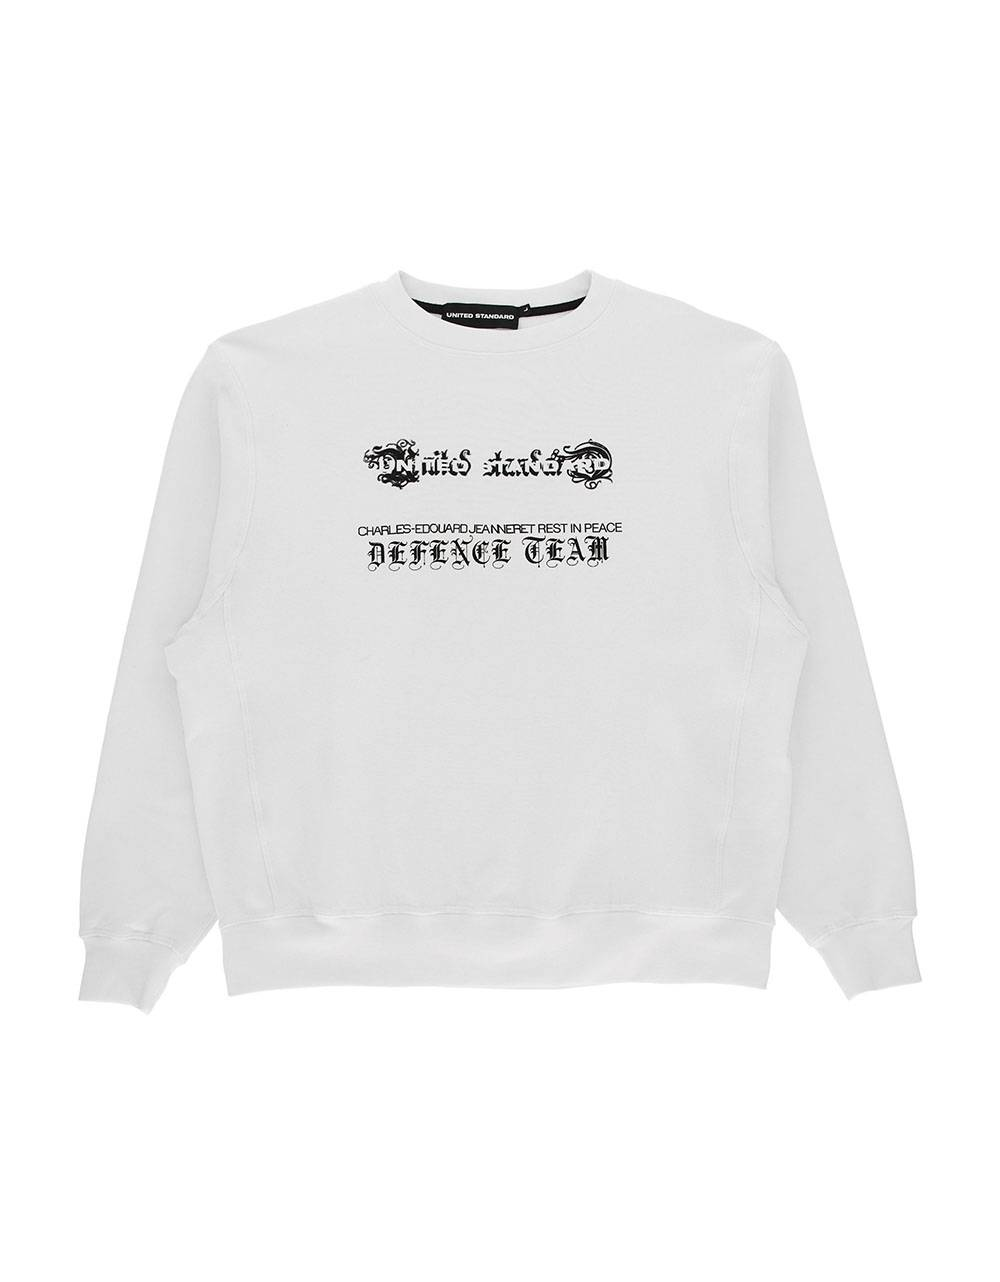 United Standard Rip crewneck sweater - white United Standard Sweater 185,00€